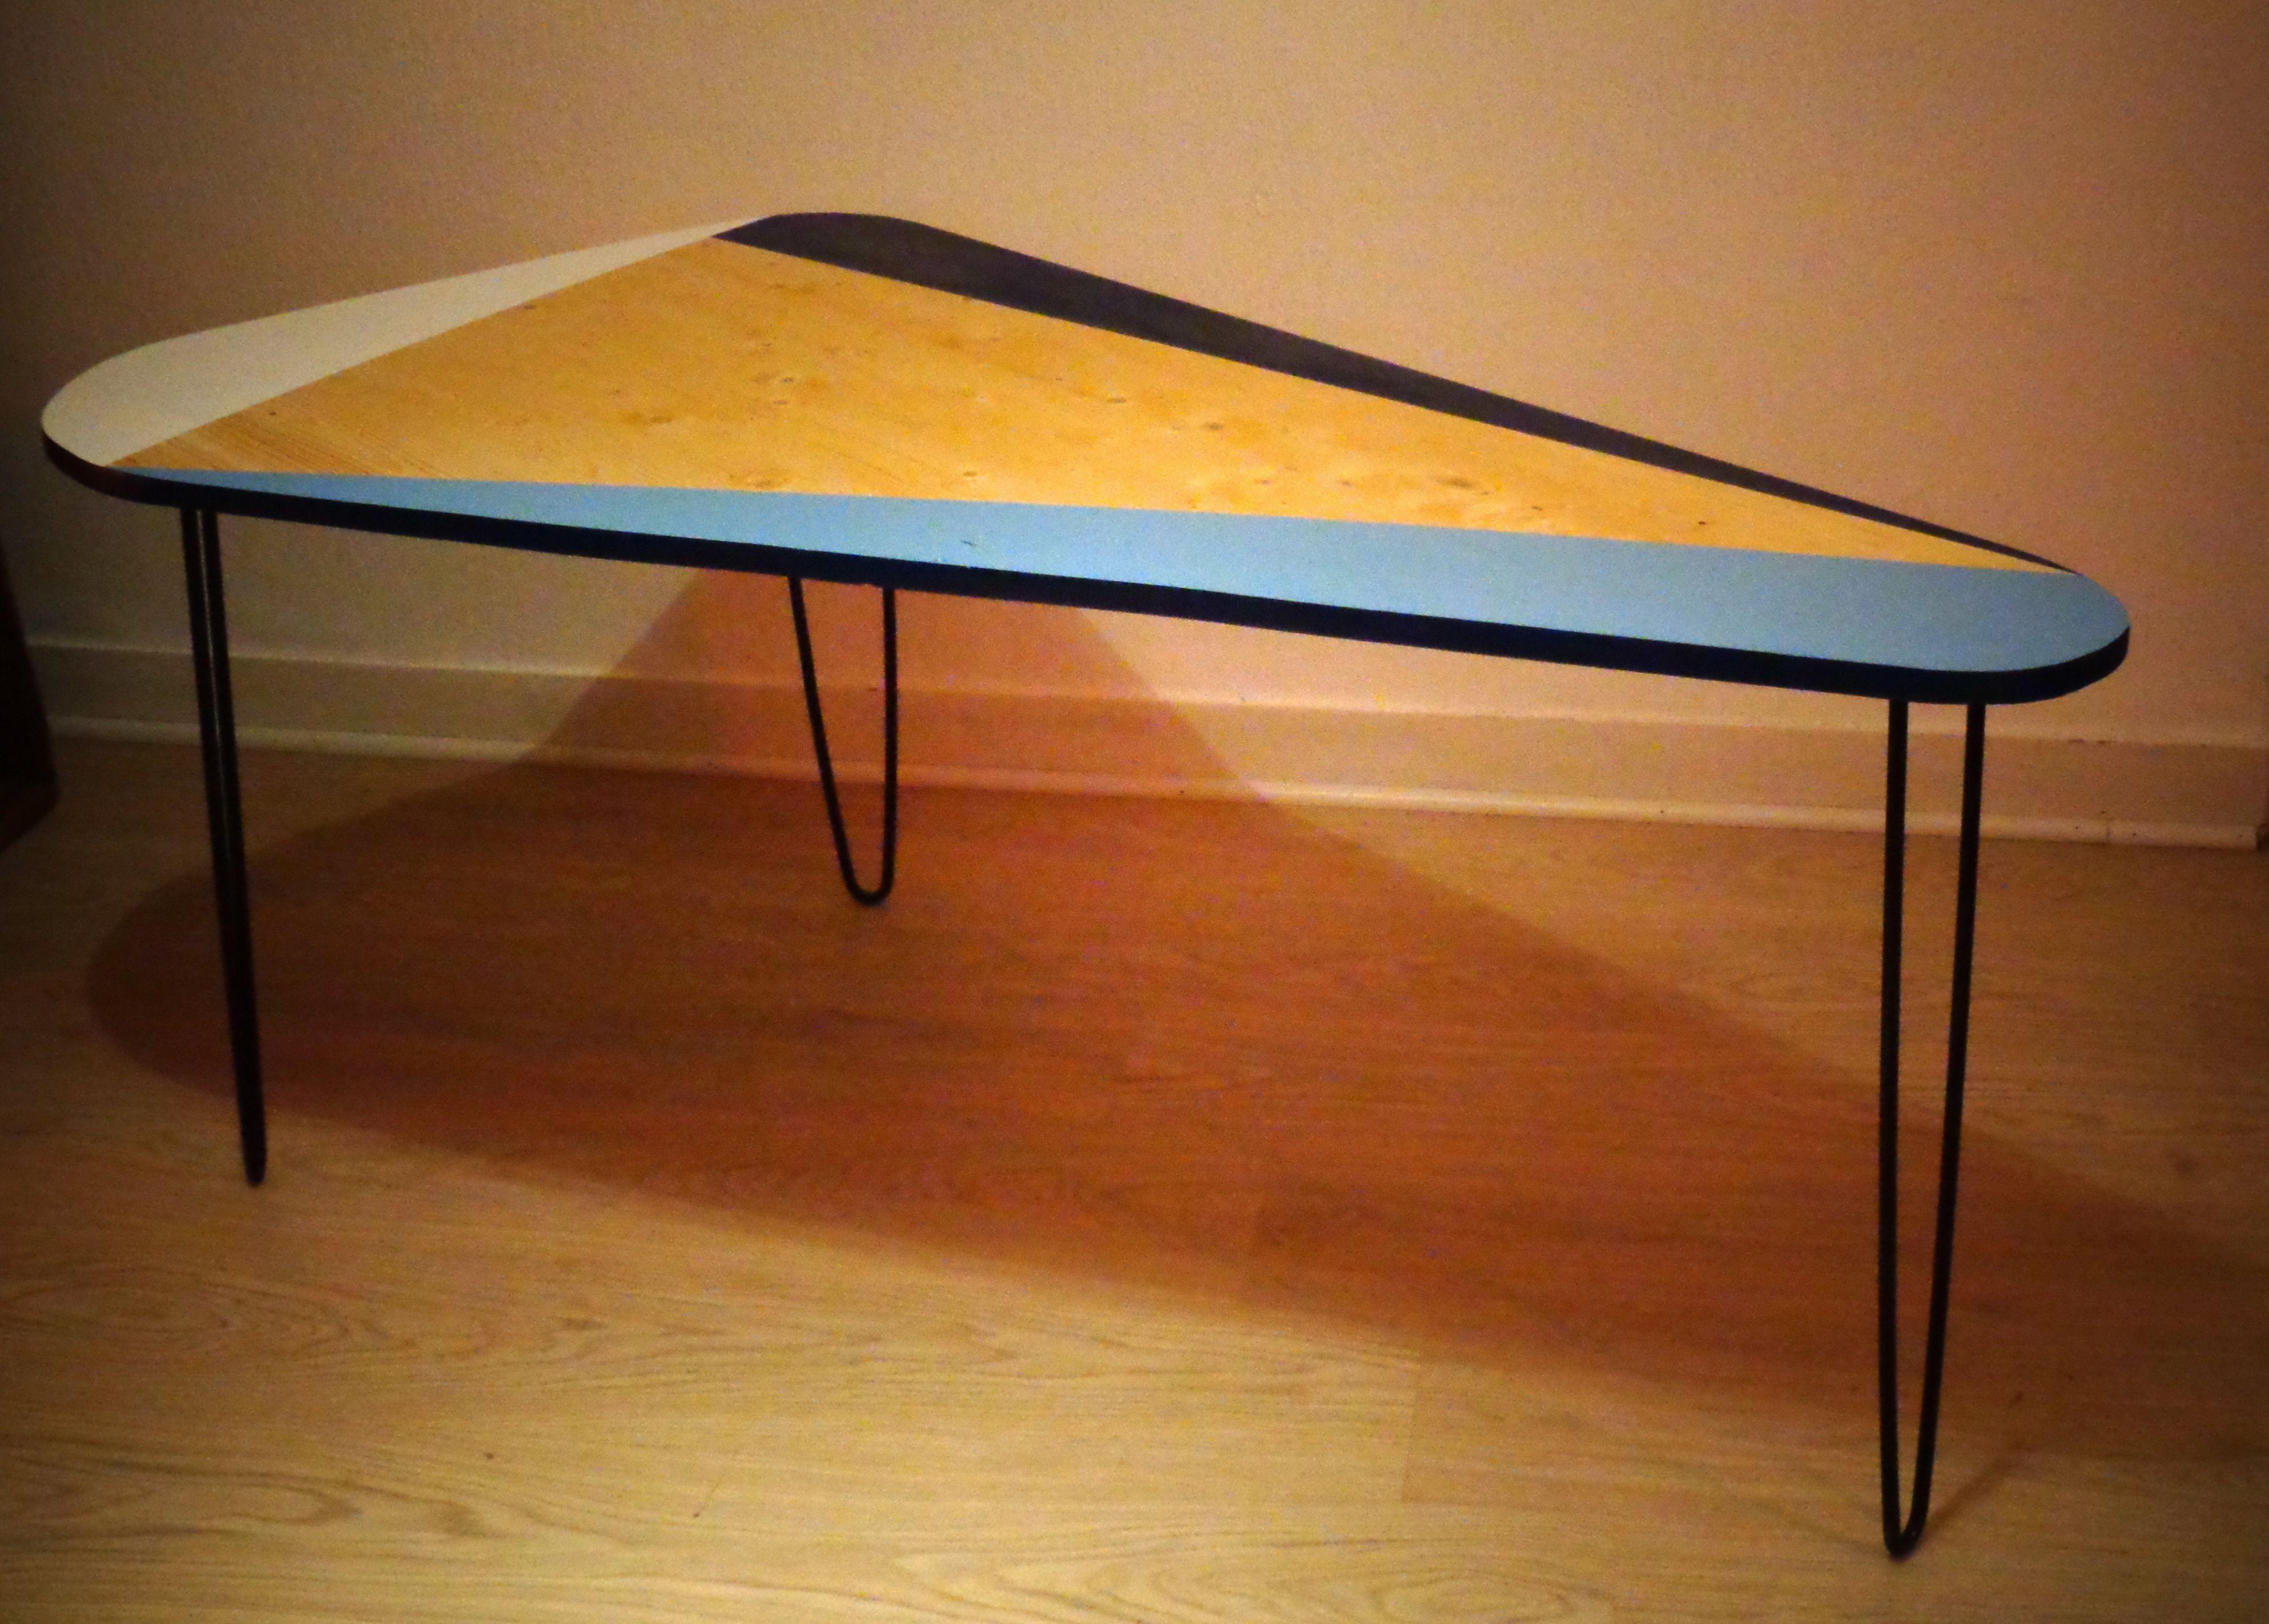 Table Basse Pieds Vintage Koadenn Home Decor Table Furniture